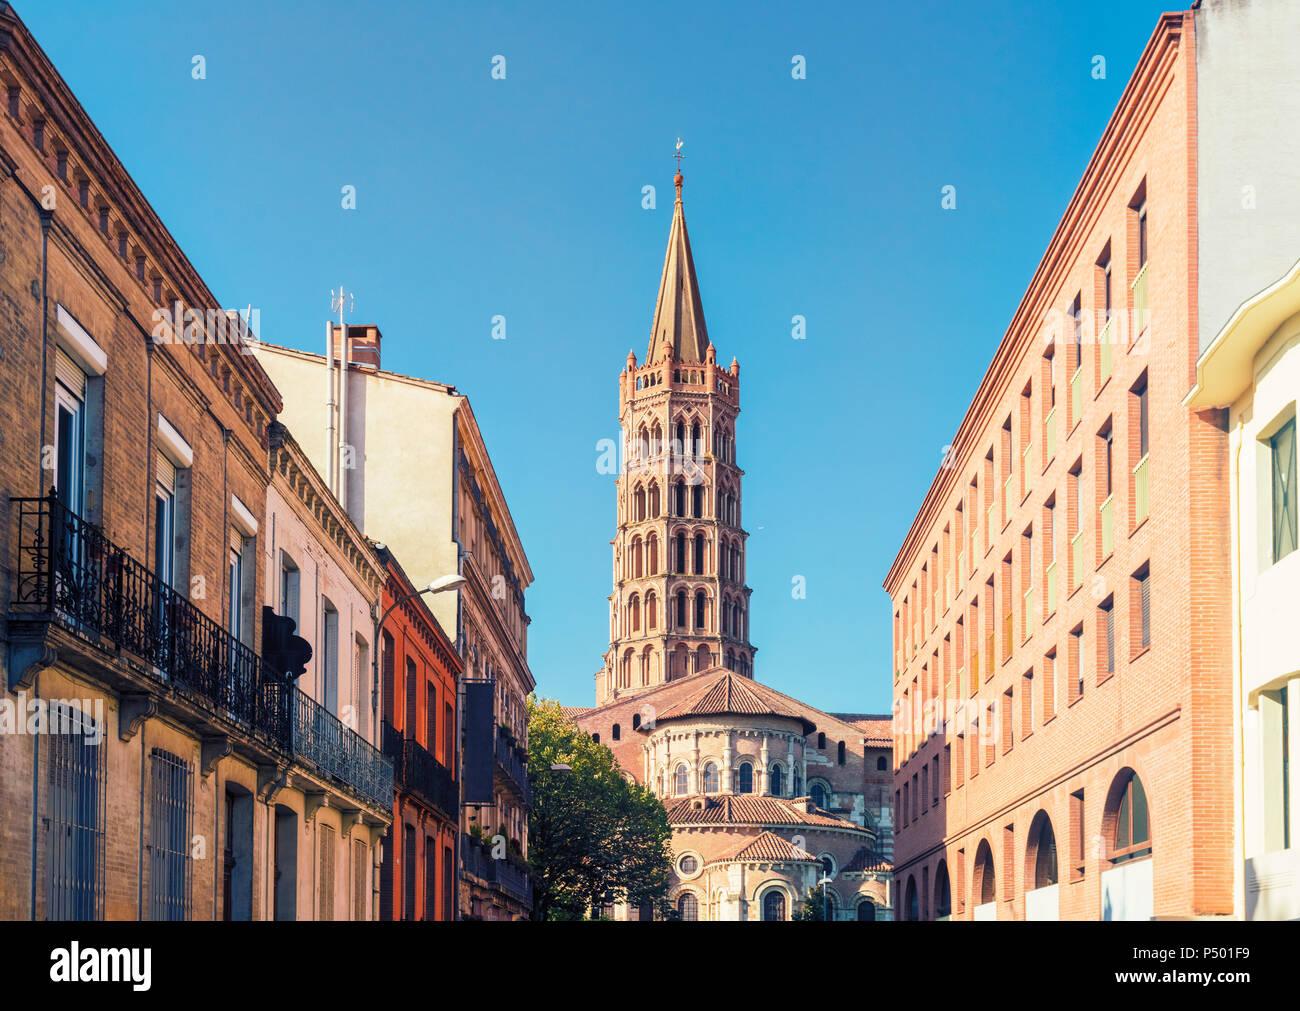 France, Haute-Garonne, Toulouse, Old town, Basilica of Saint Sernin - Stock Image